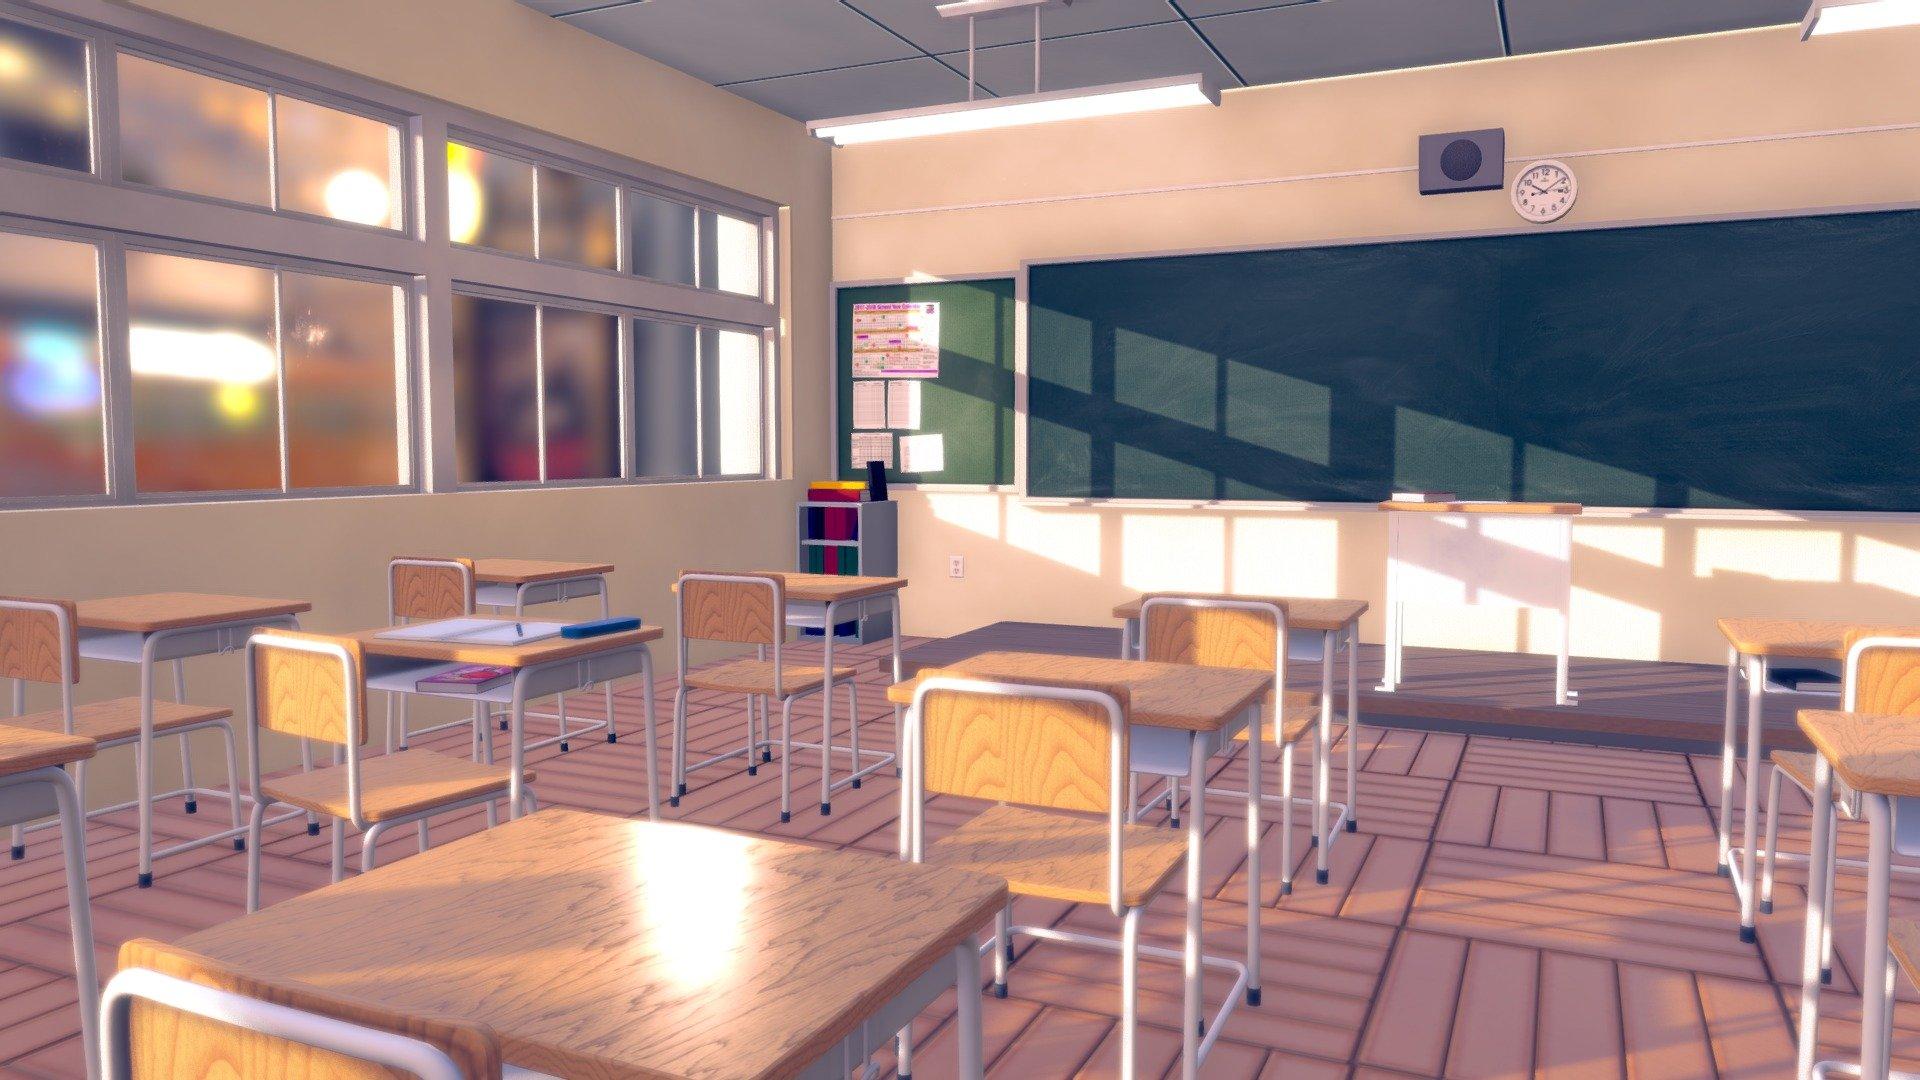 Anime Classroom - Download Free 3D model by BigMiniGeek ...